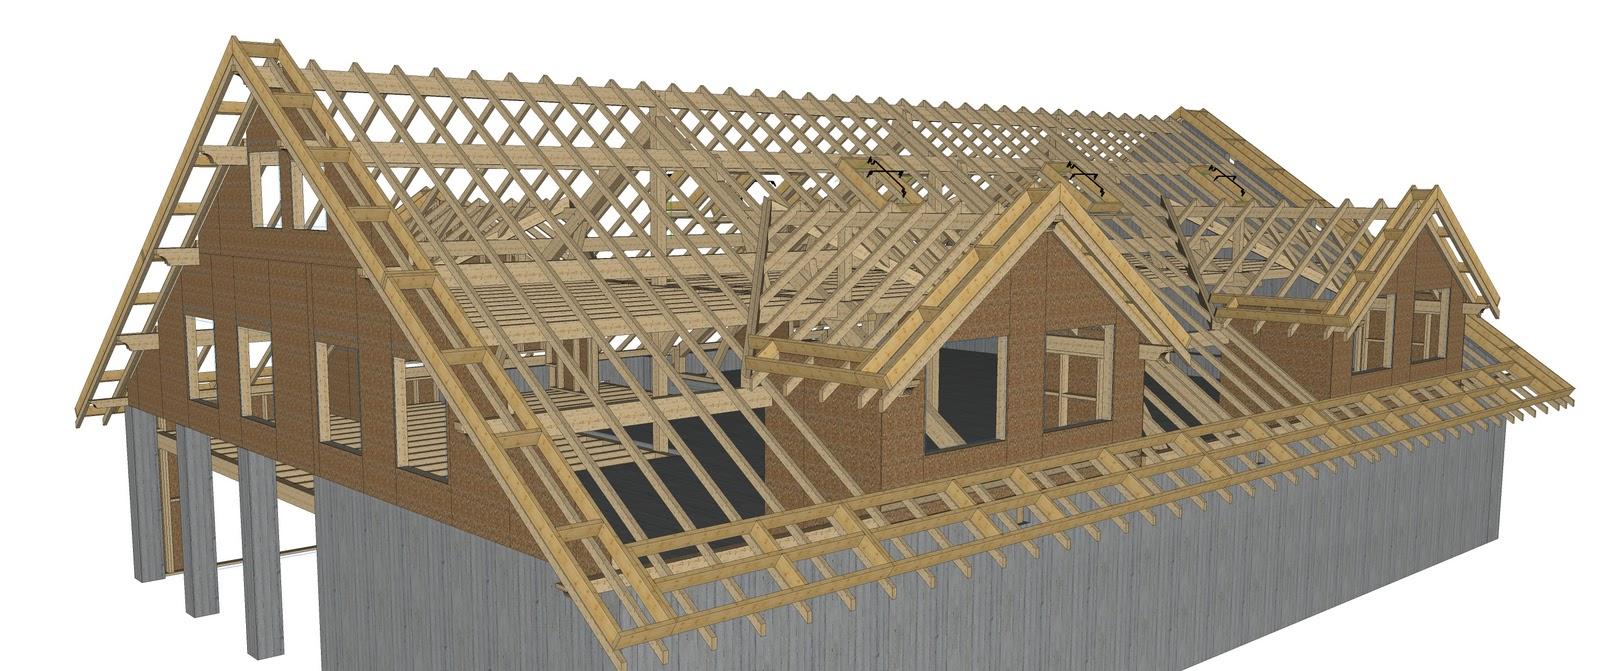 perrin associ s charpente de ferme. Black Bedroom Furniture Sets. Home Design Ideas